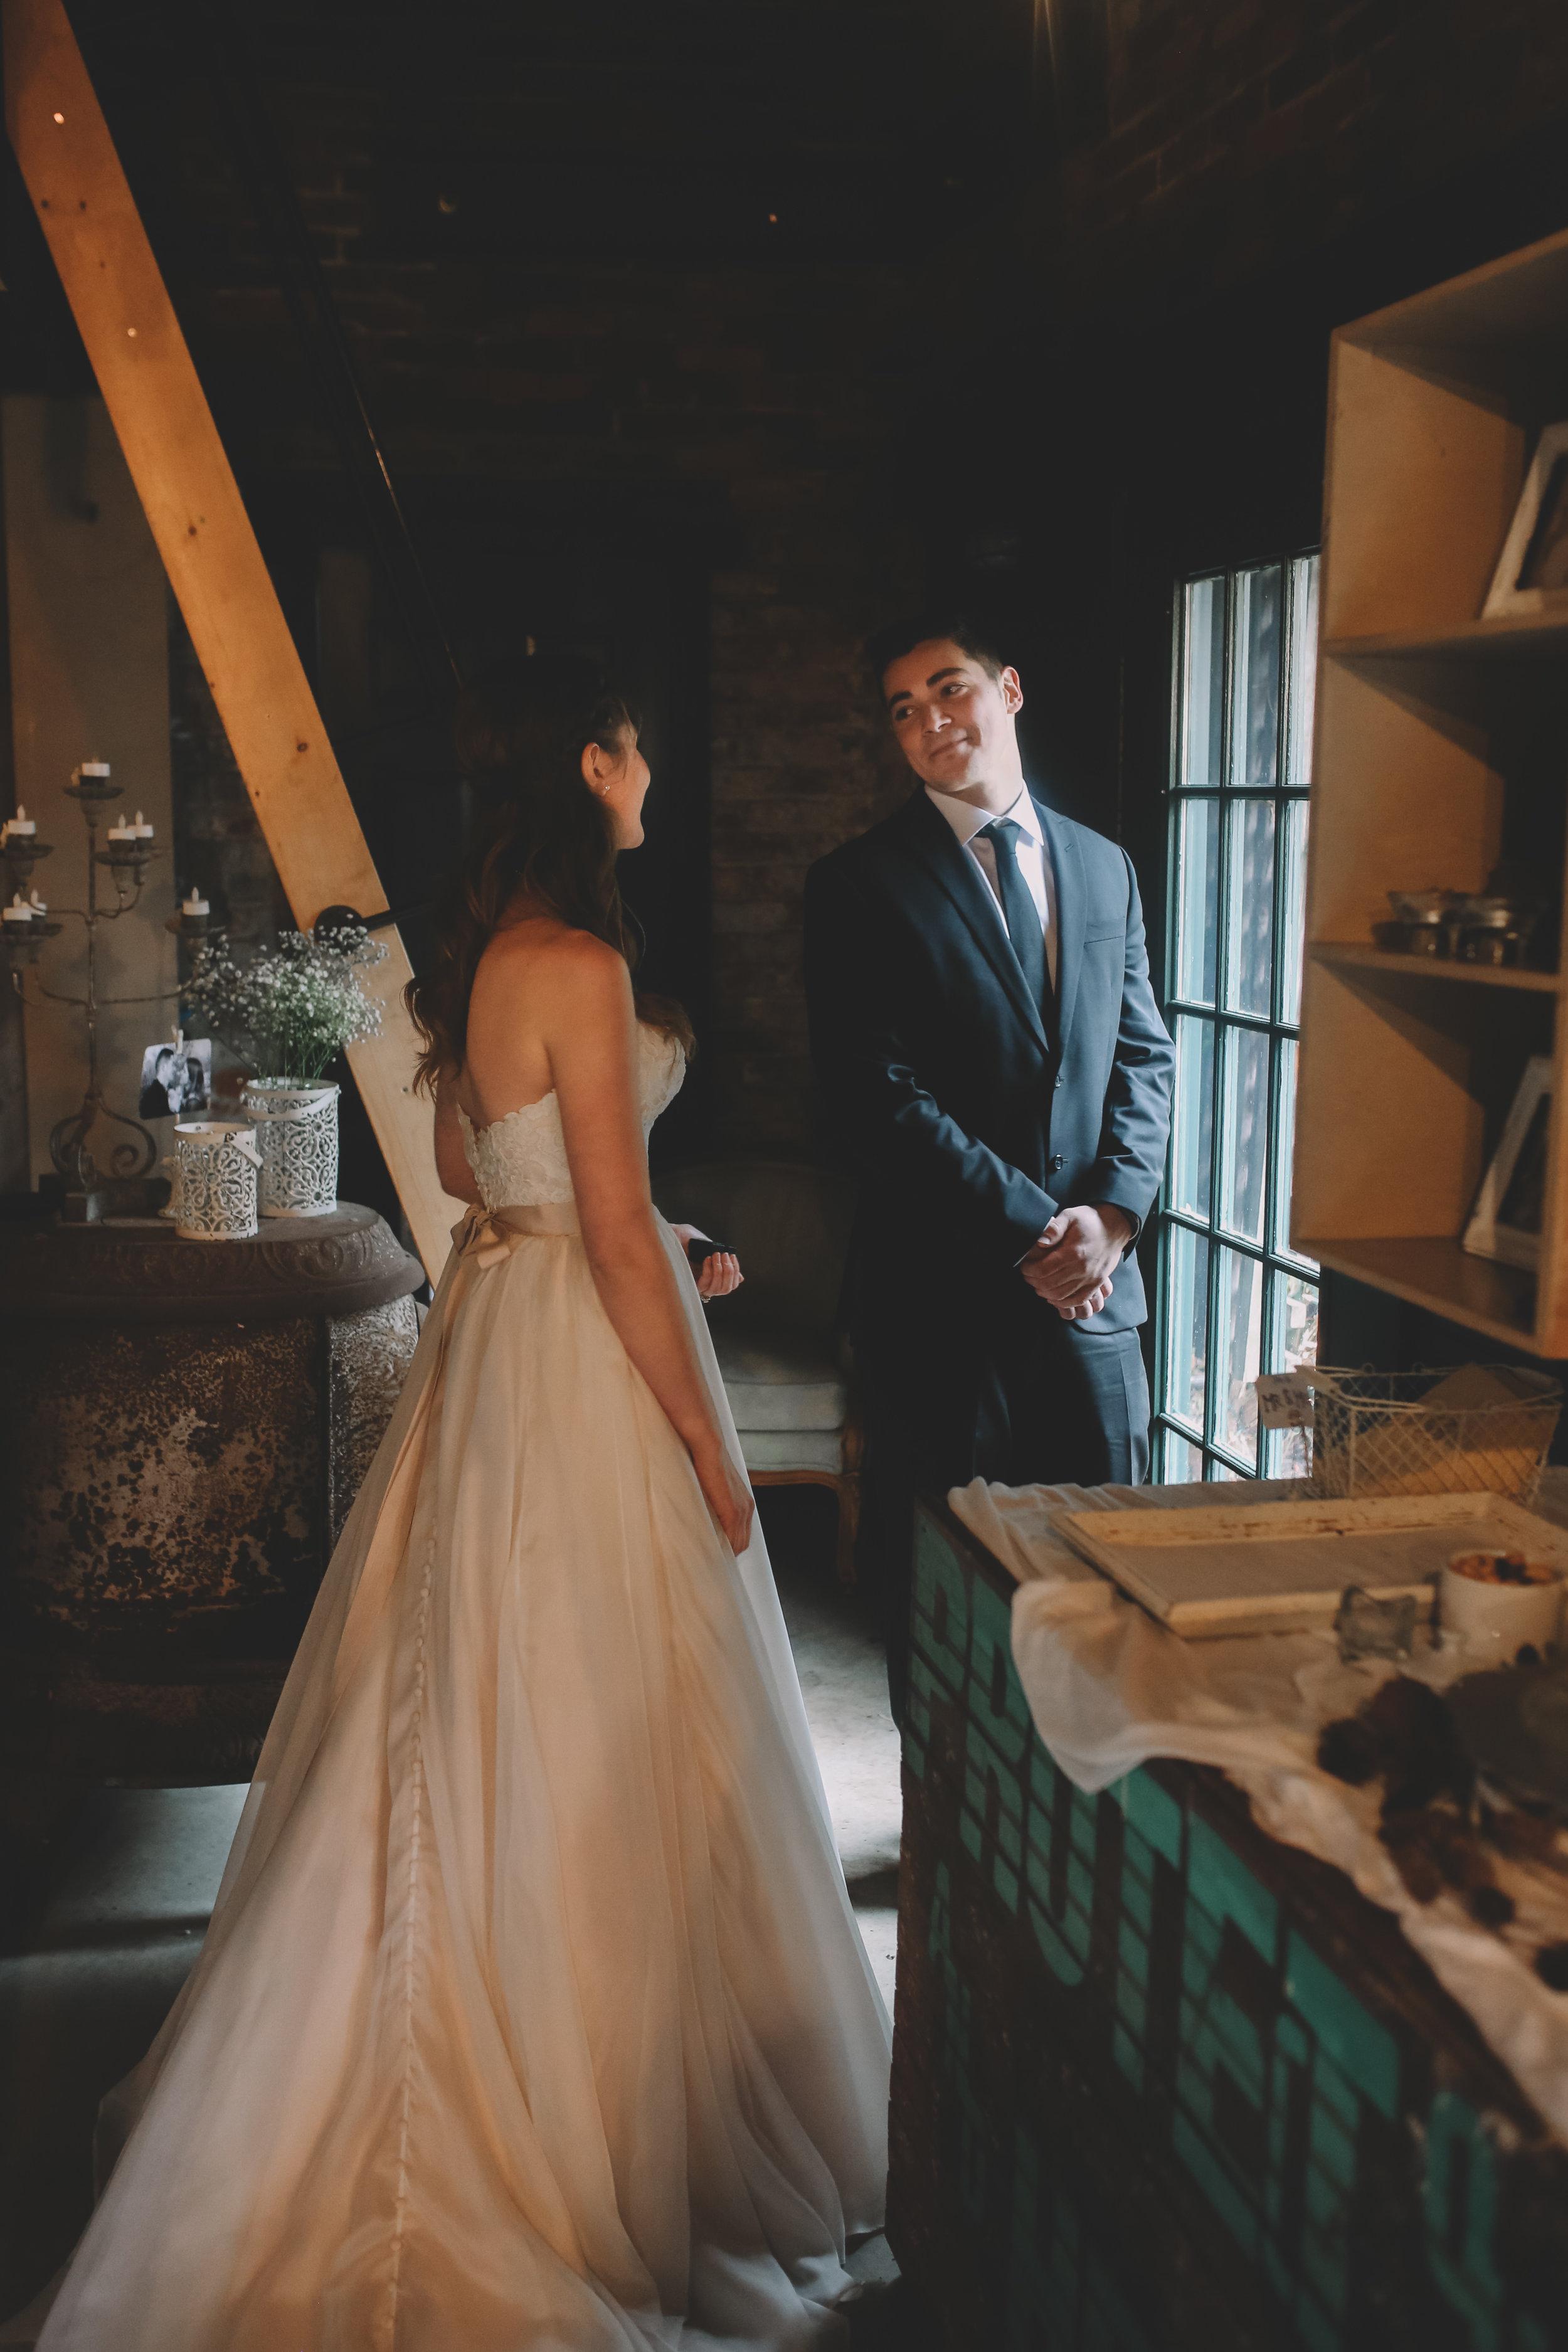 Jake + Brittney Balbas Airbnb Carriage House Wedding Evansville IN (52 of 426).jpg